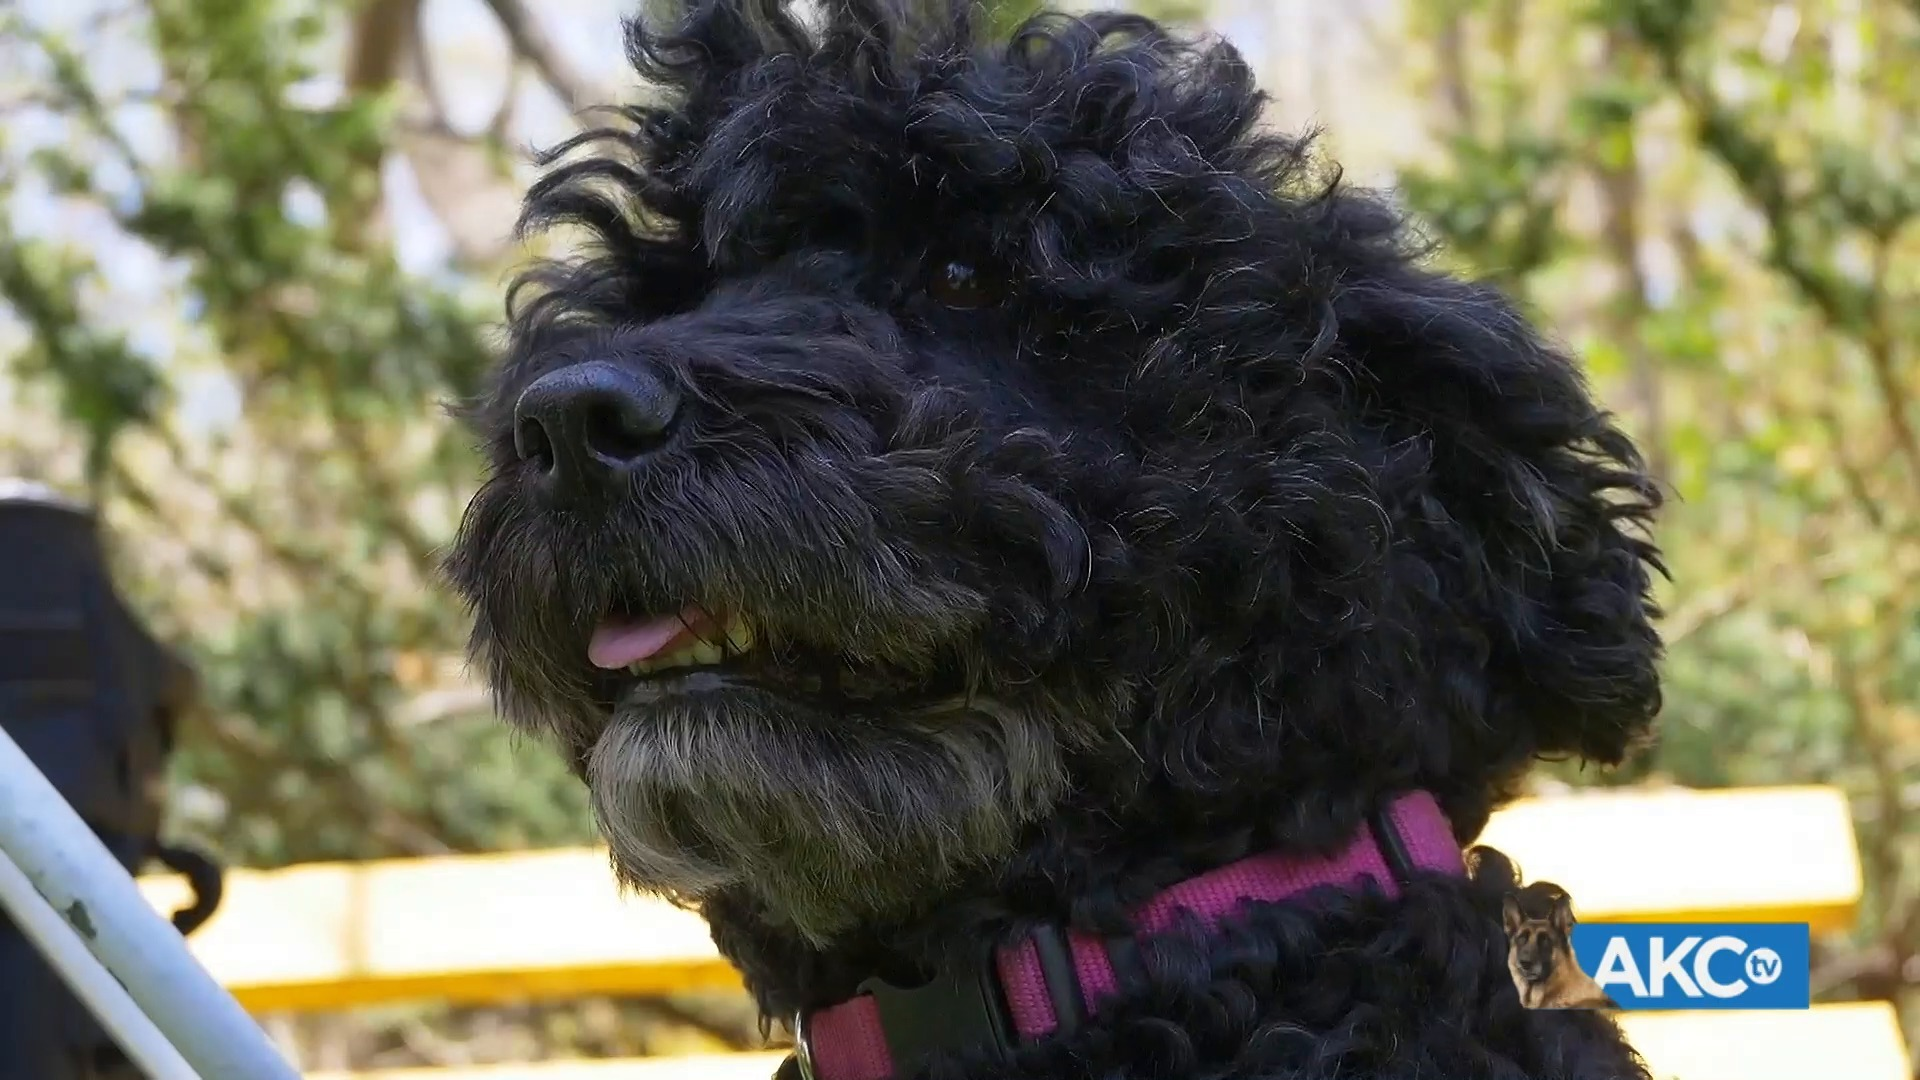 AKC DogCenter: Live from 101 Park - Hypoallergenic Dog Breeds | AKC.TV